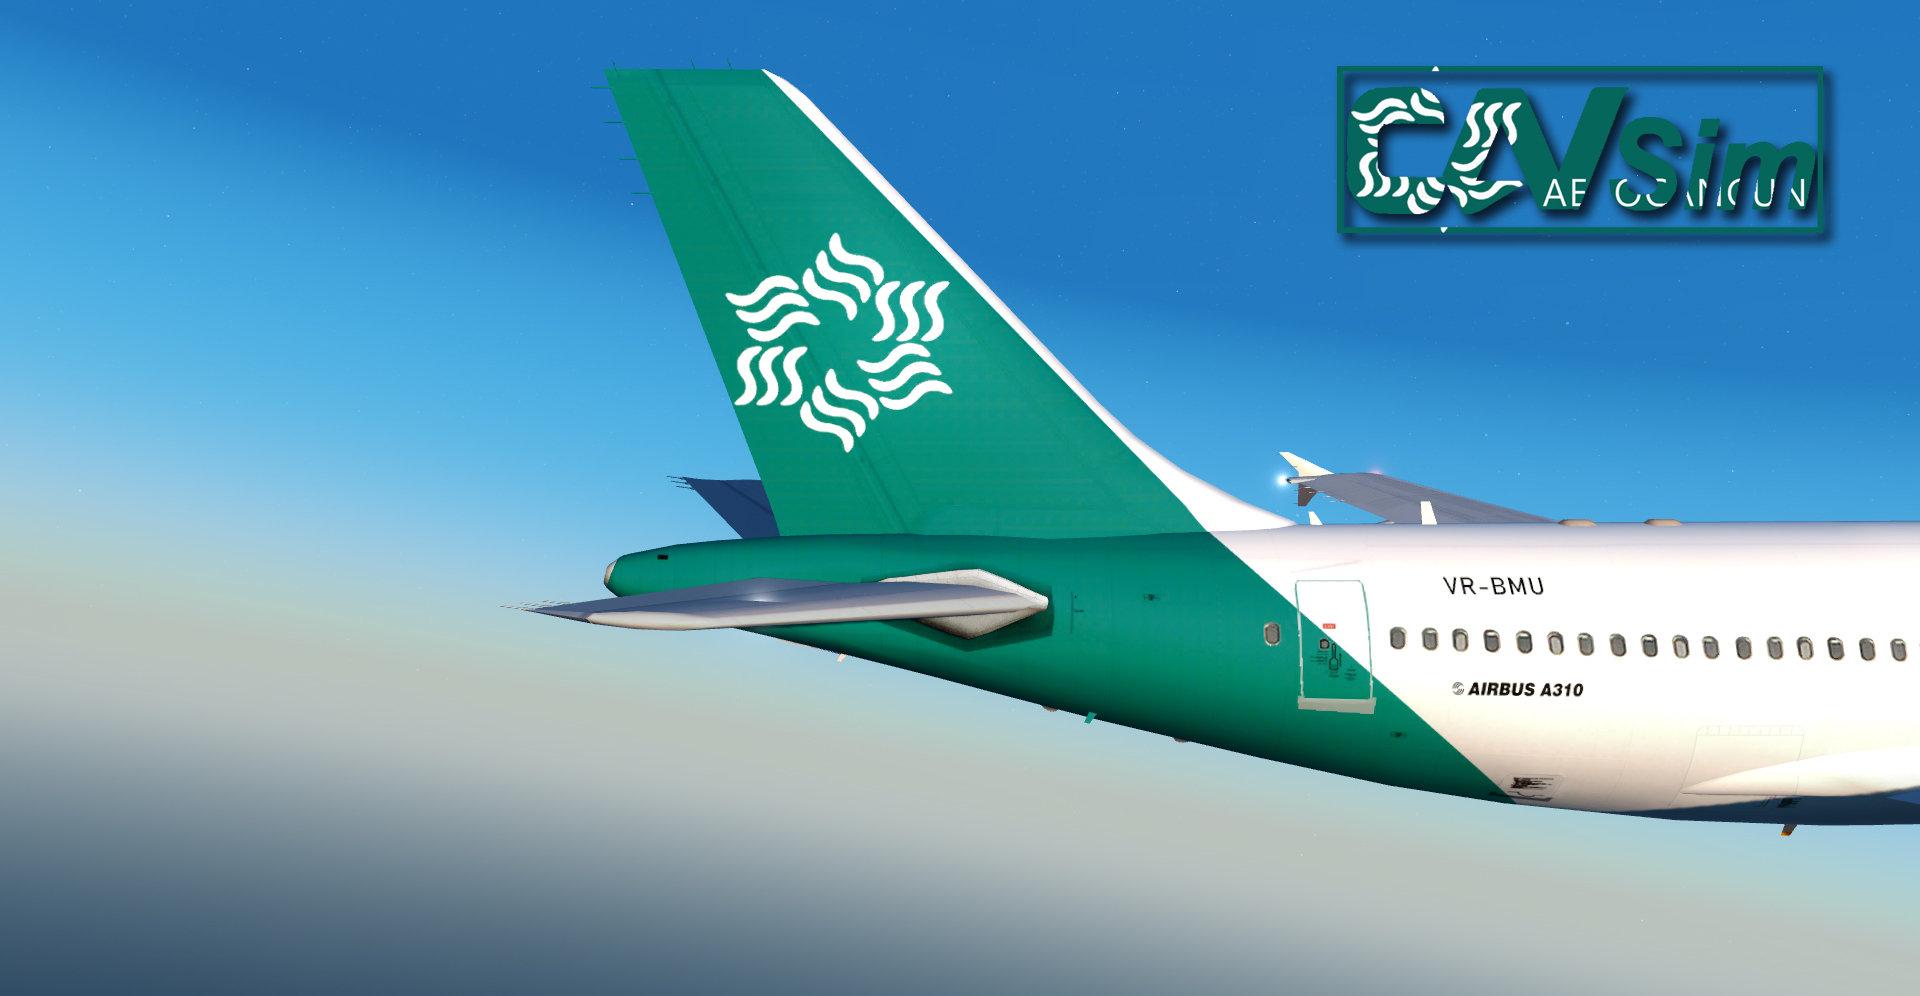 Airbus A310-324R Aerocancun 'Last Livery' 'VR-BMU'